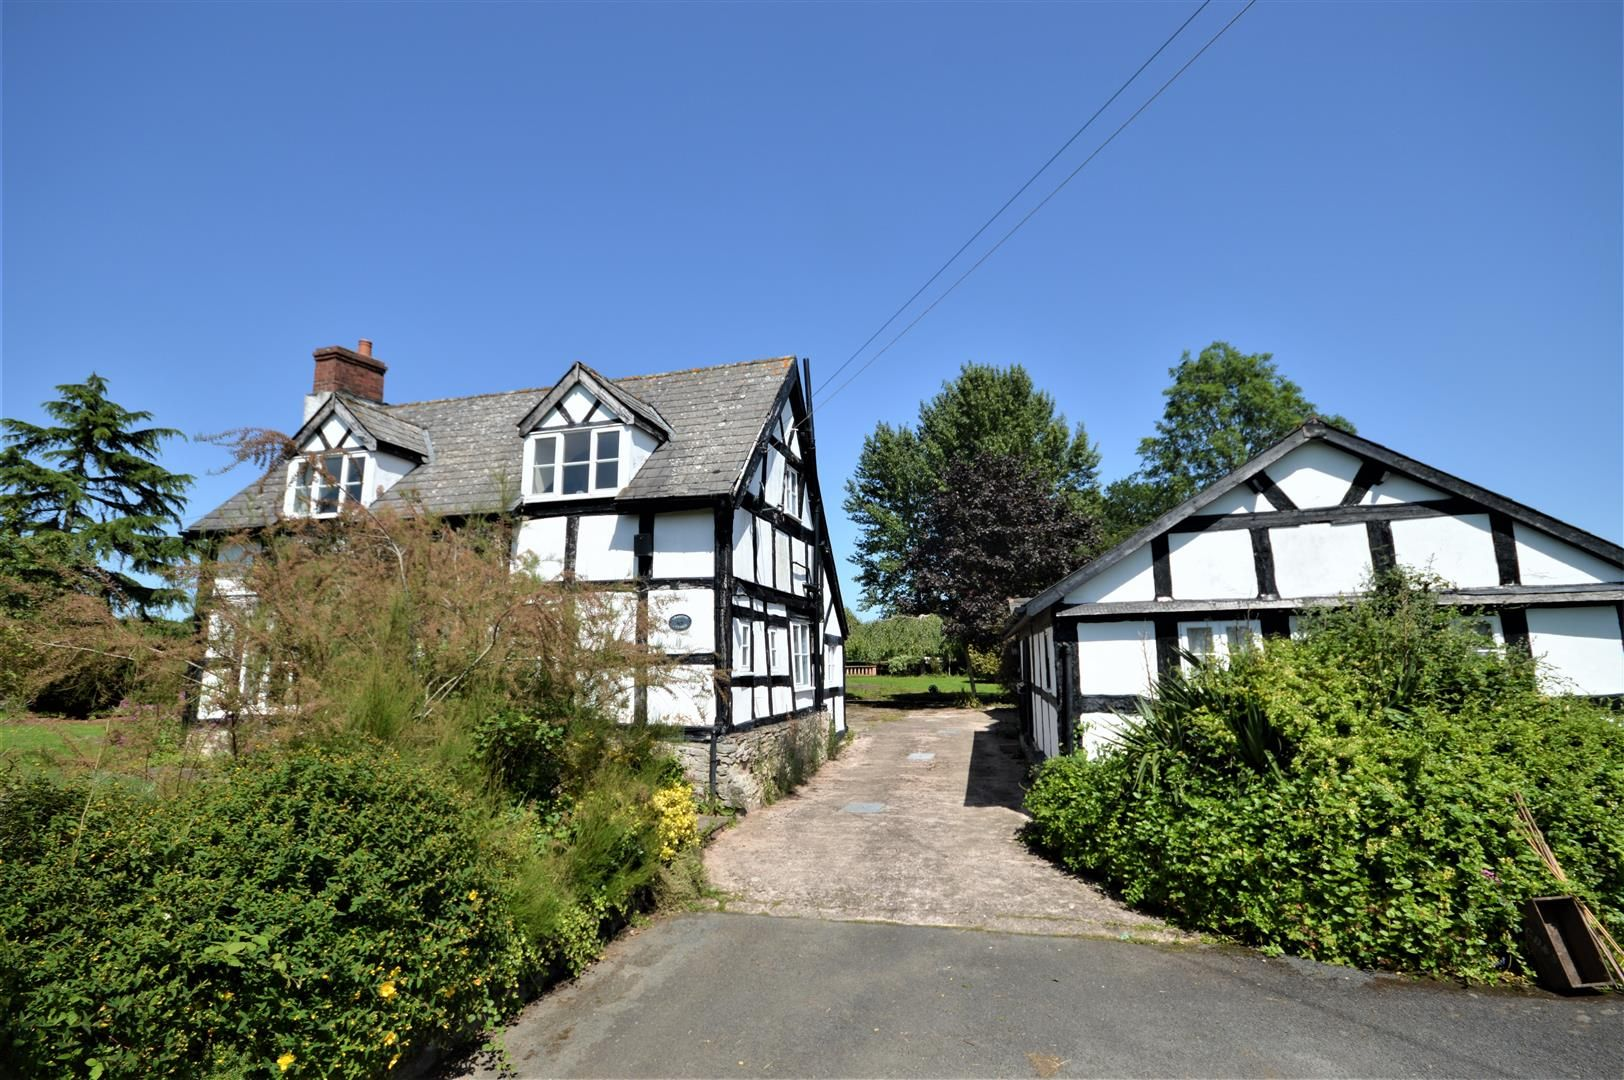 3 bed cottage for sale in Eardisland, HR6